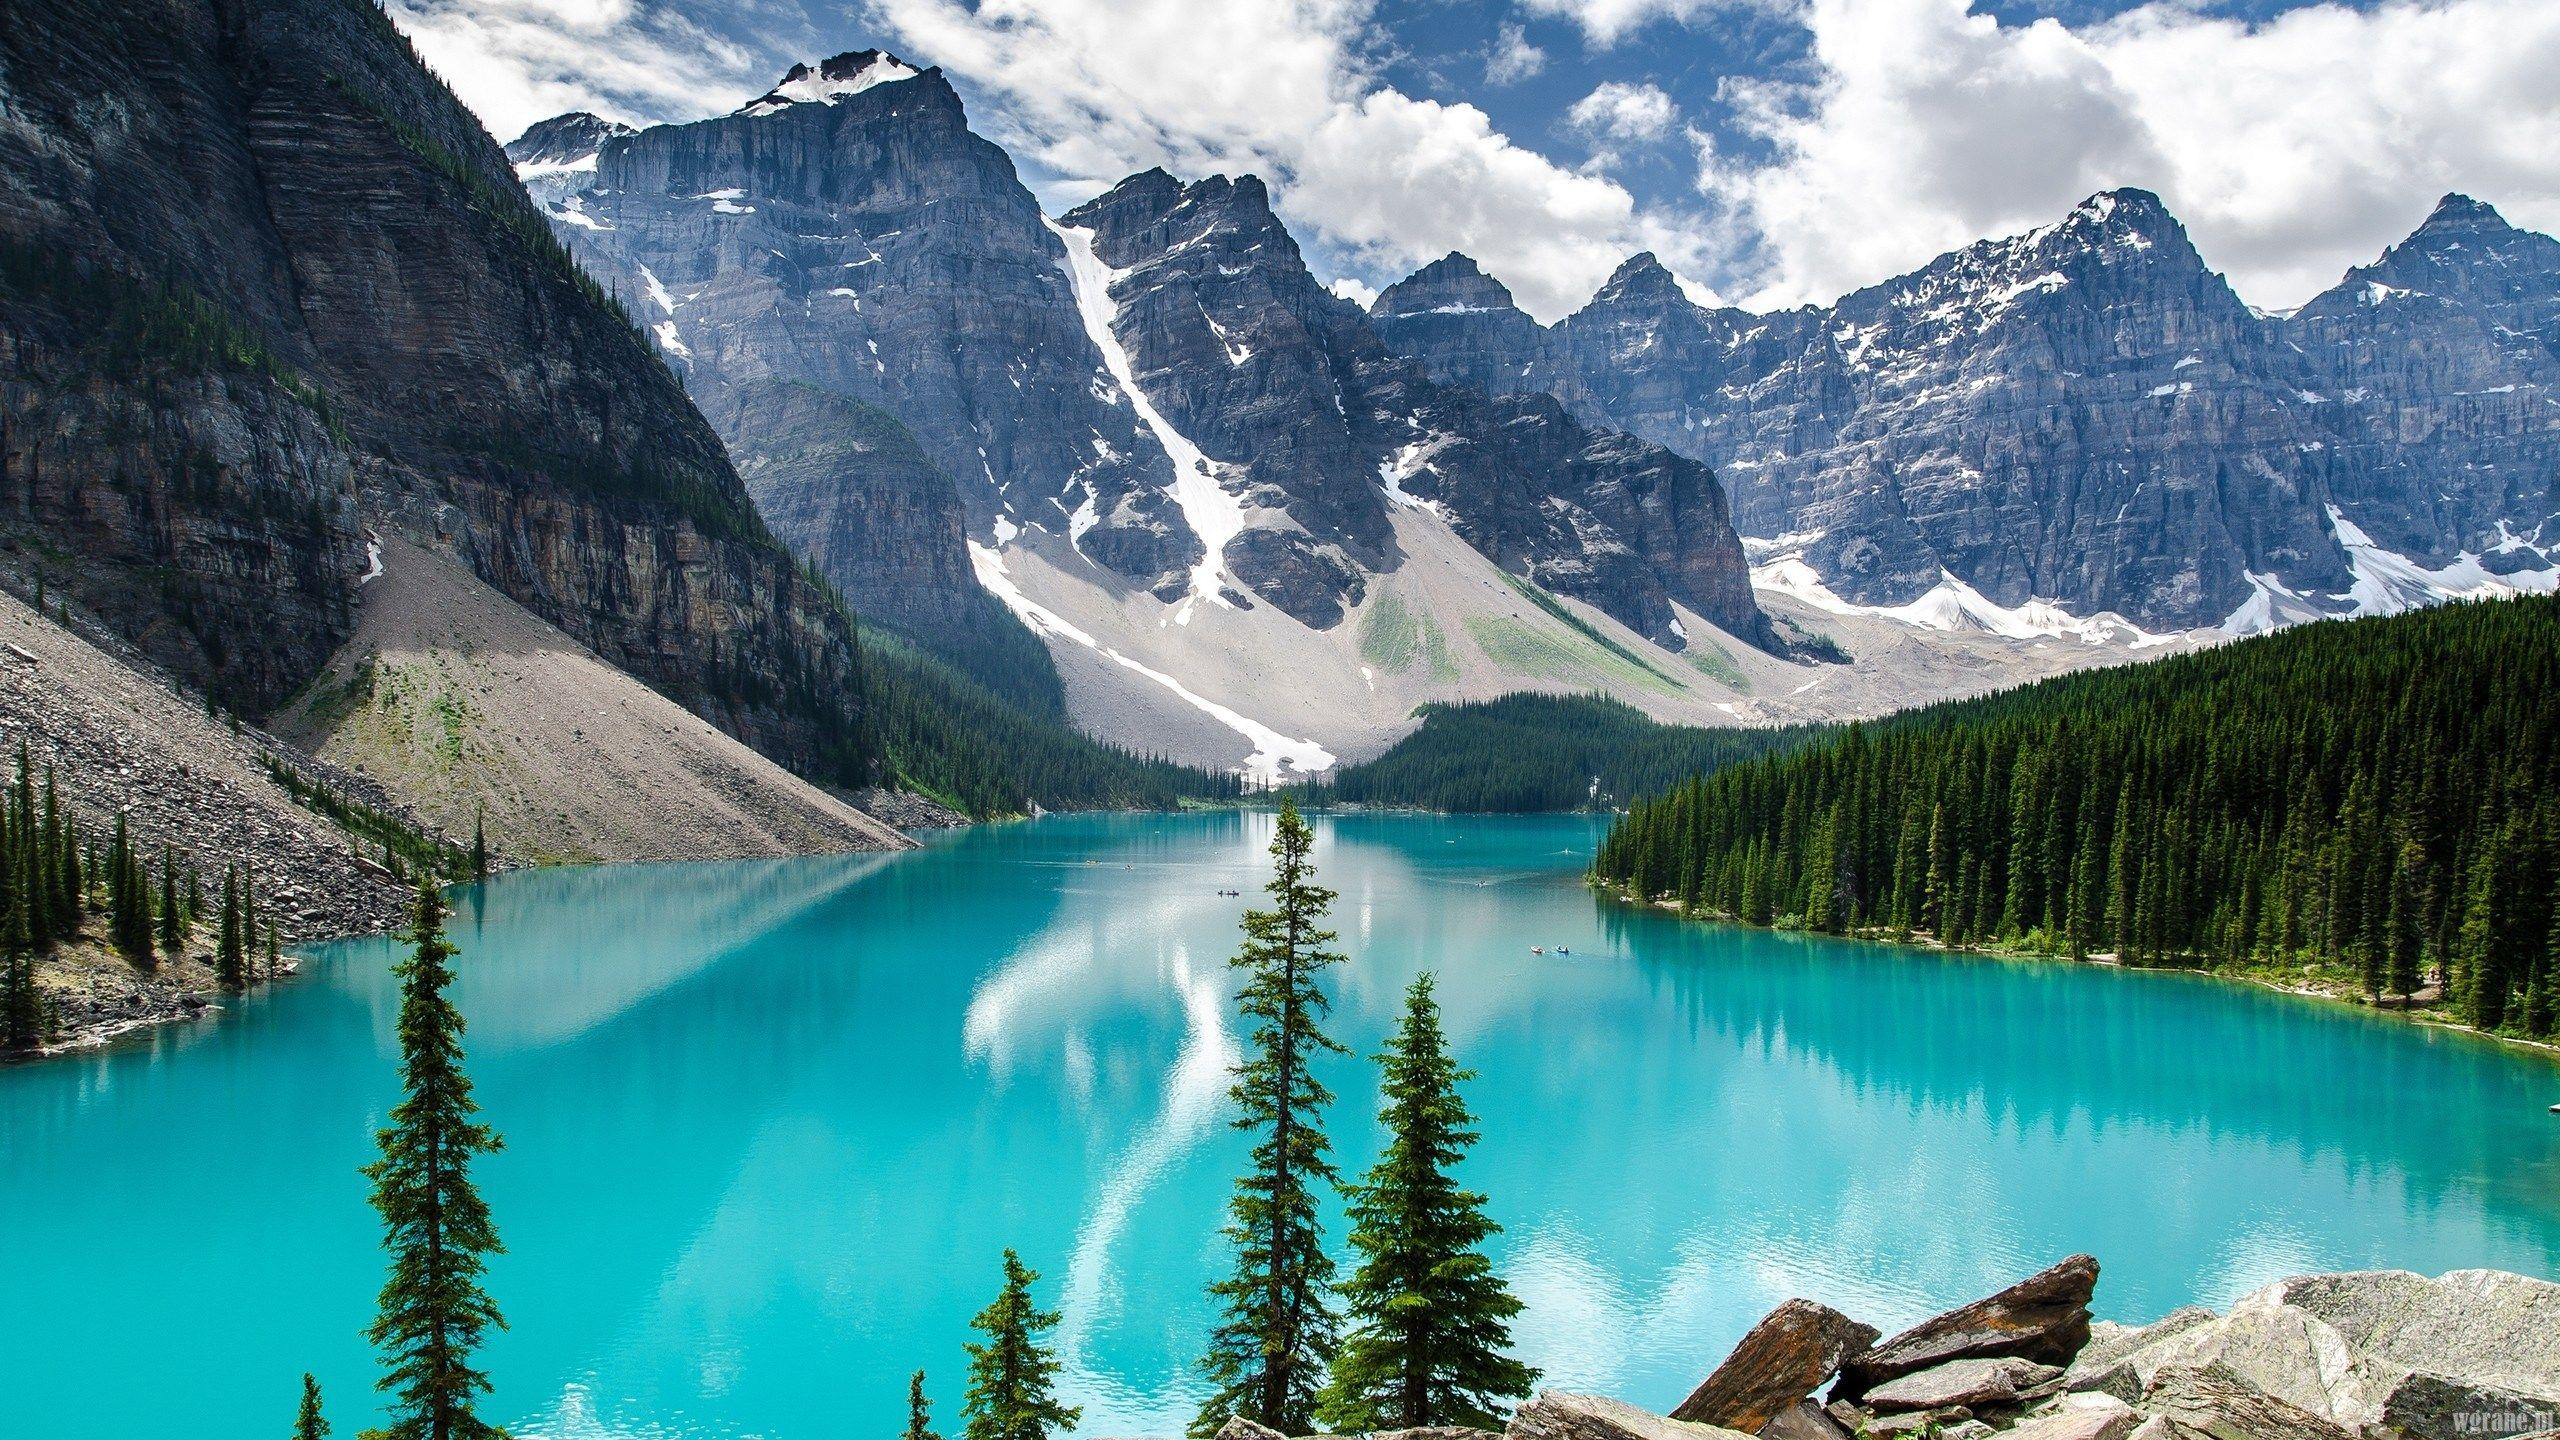 moraine lake 2560 x 1440 wallpaper